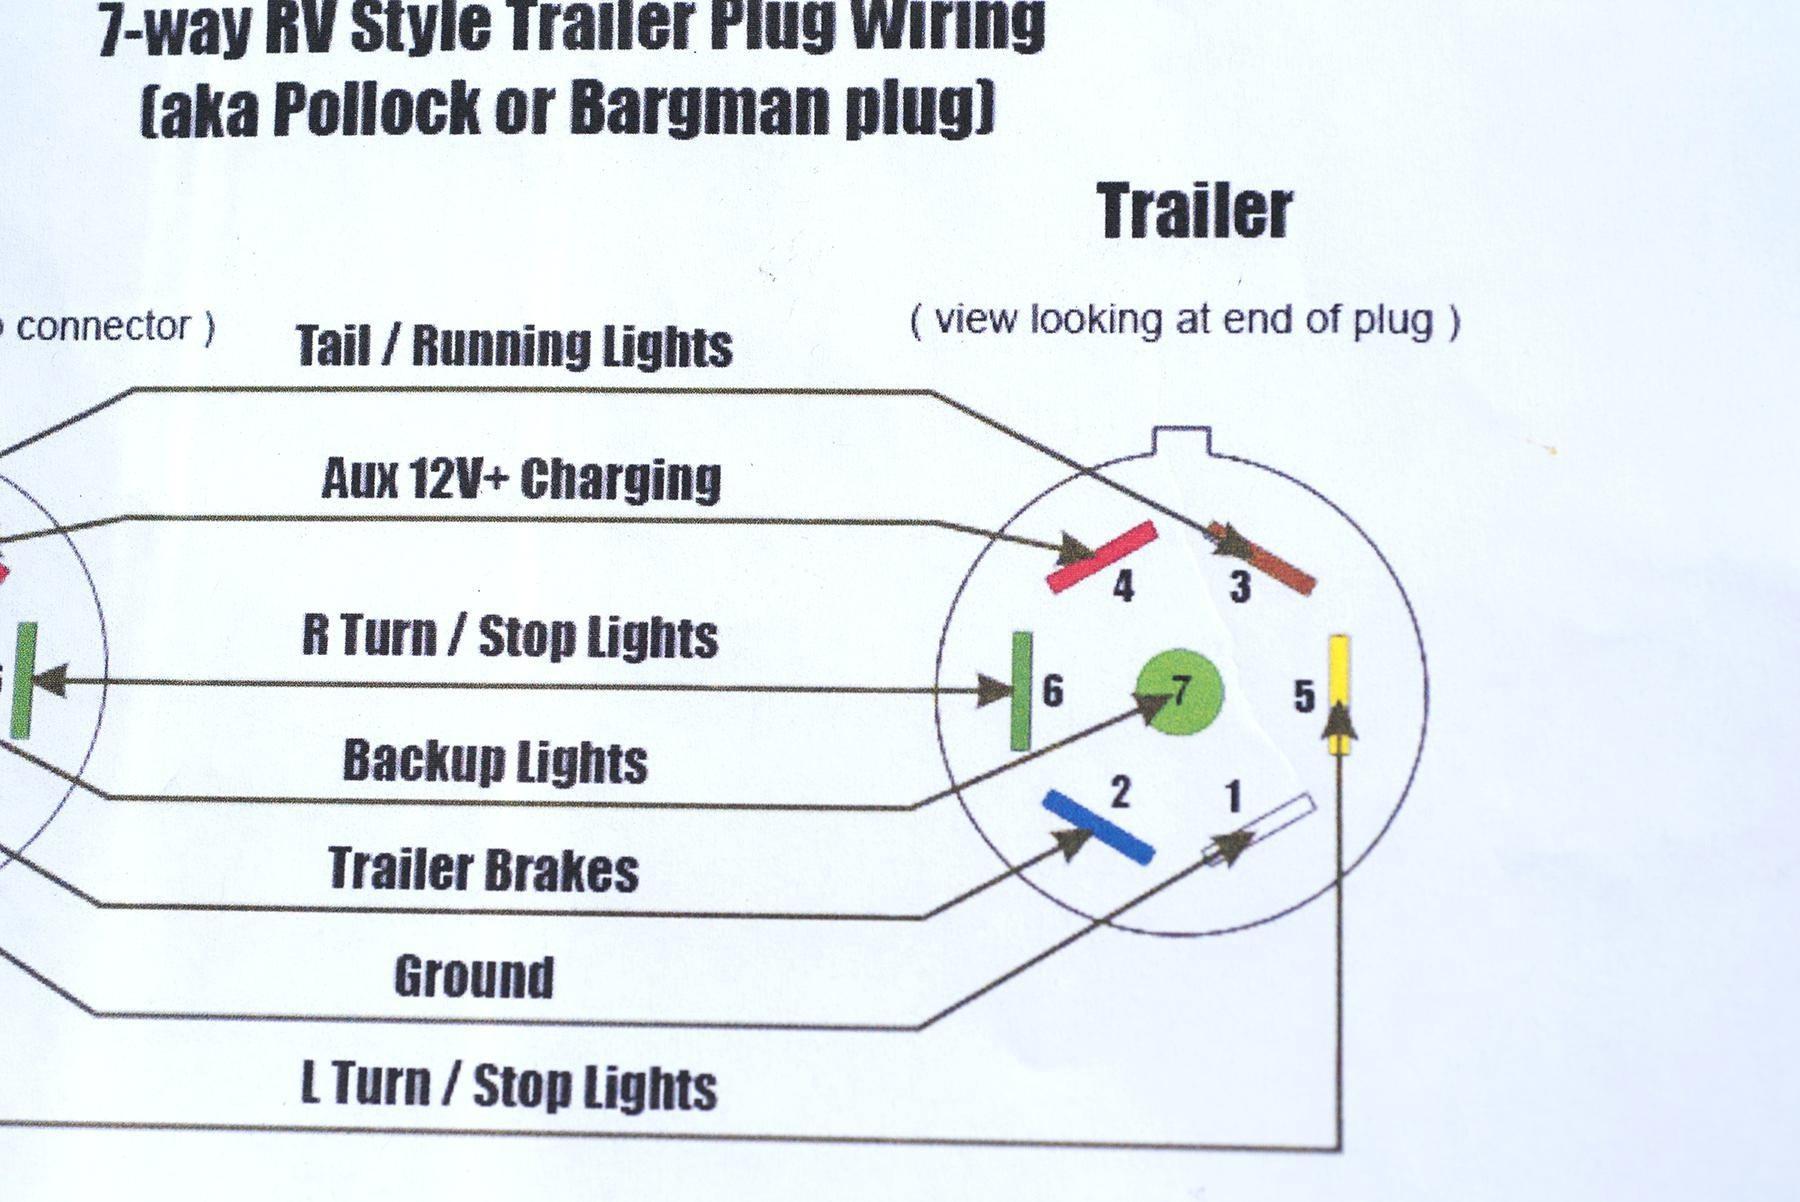 7 Way Plug Wiring Diagram Trailer | Wiring Diagram - 7 Way Trailer Plug Wiring Diagram Dodge